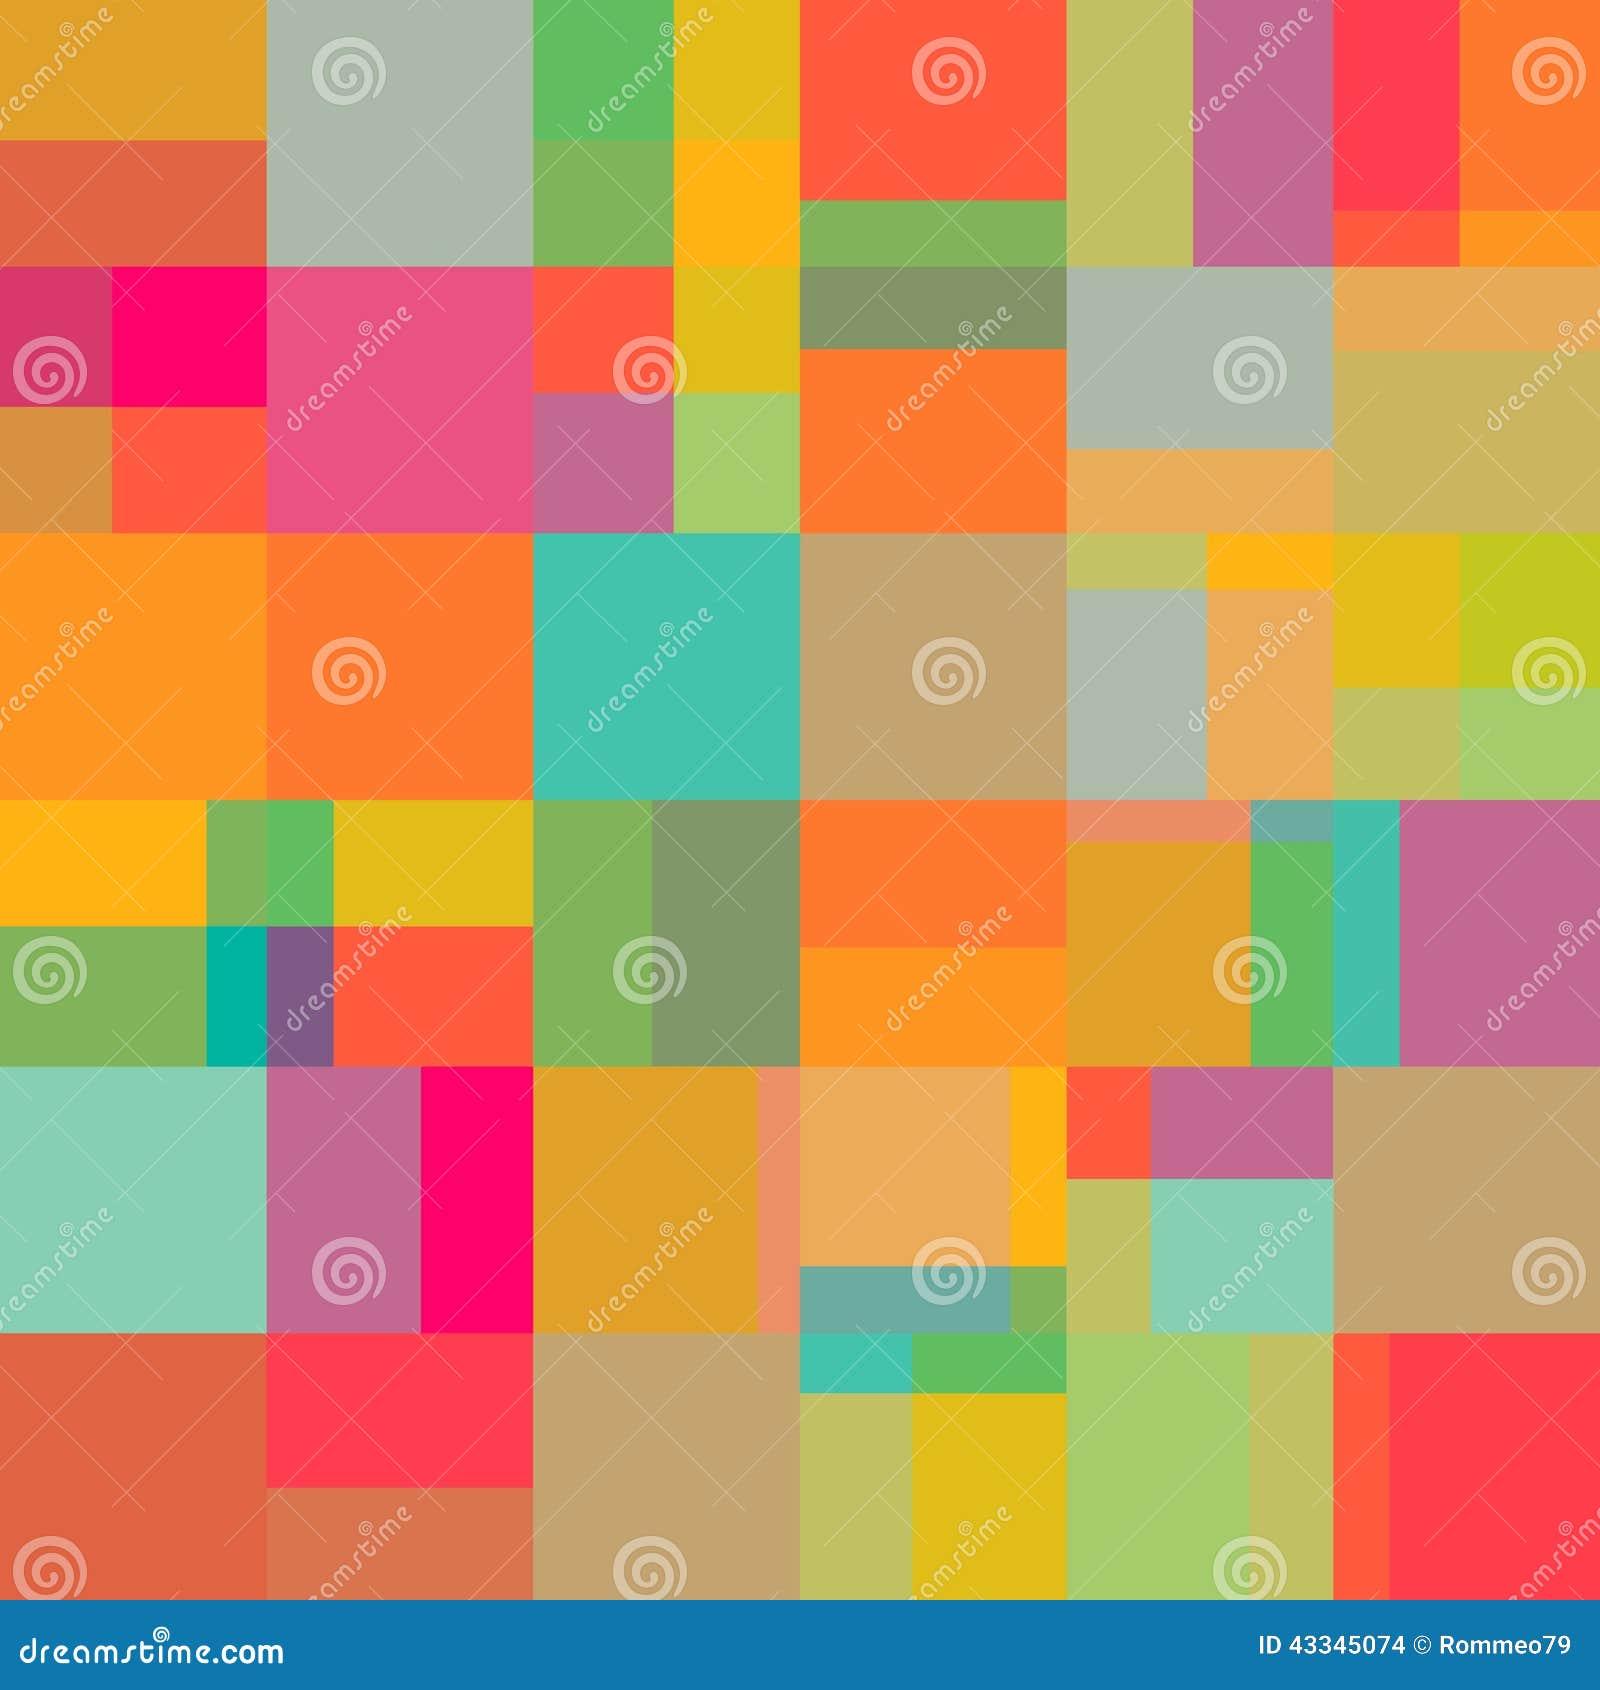 Art, Shape, Colors, Design, Vector, Squares, Stock Vector - Image ...